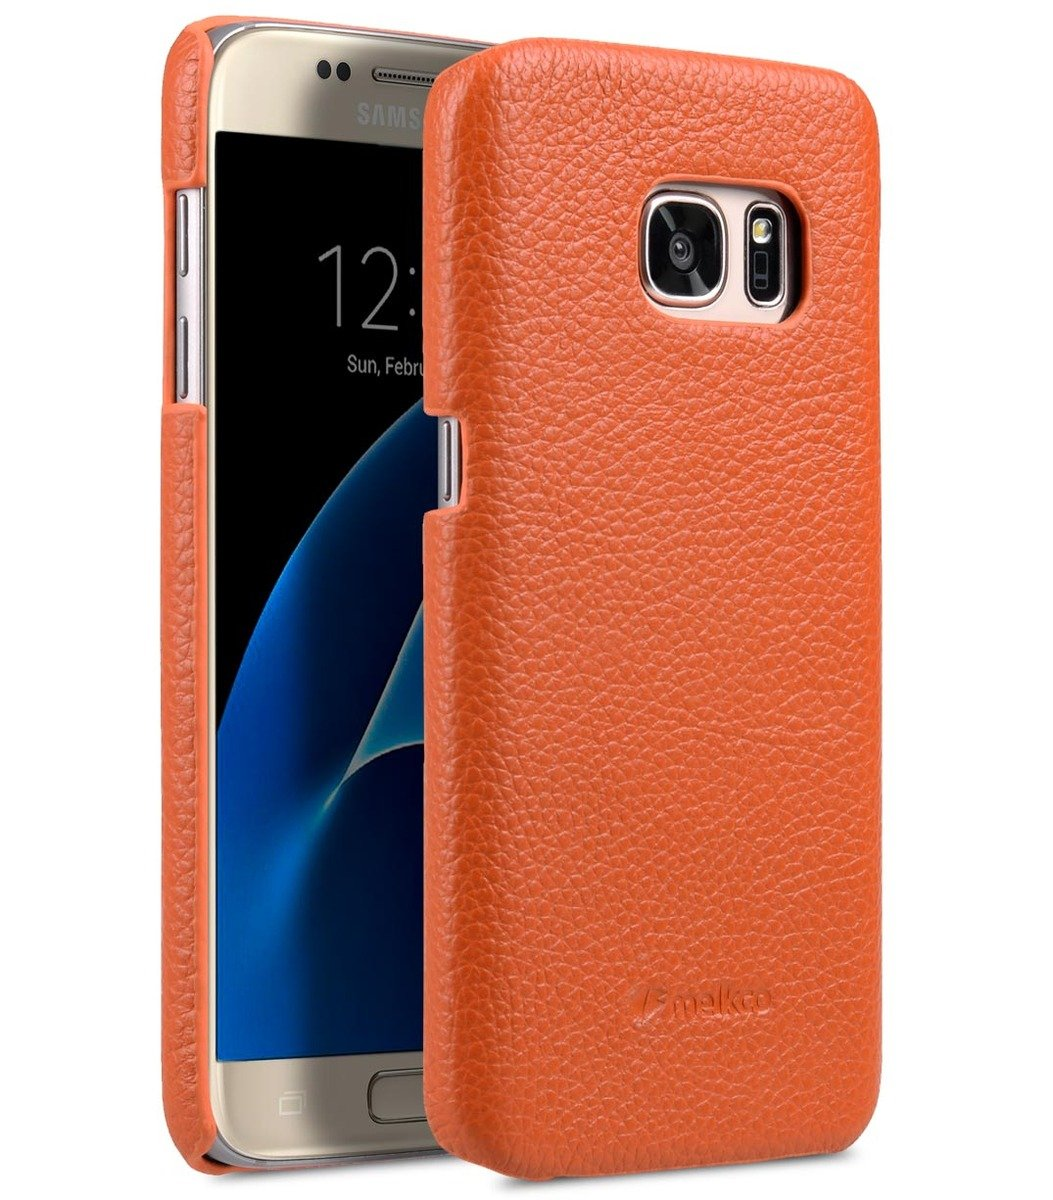 Samsung Galaxy S7 荔枝紋真皮背殼 (橙色)